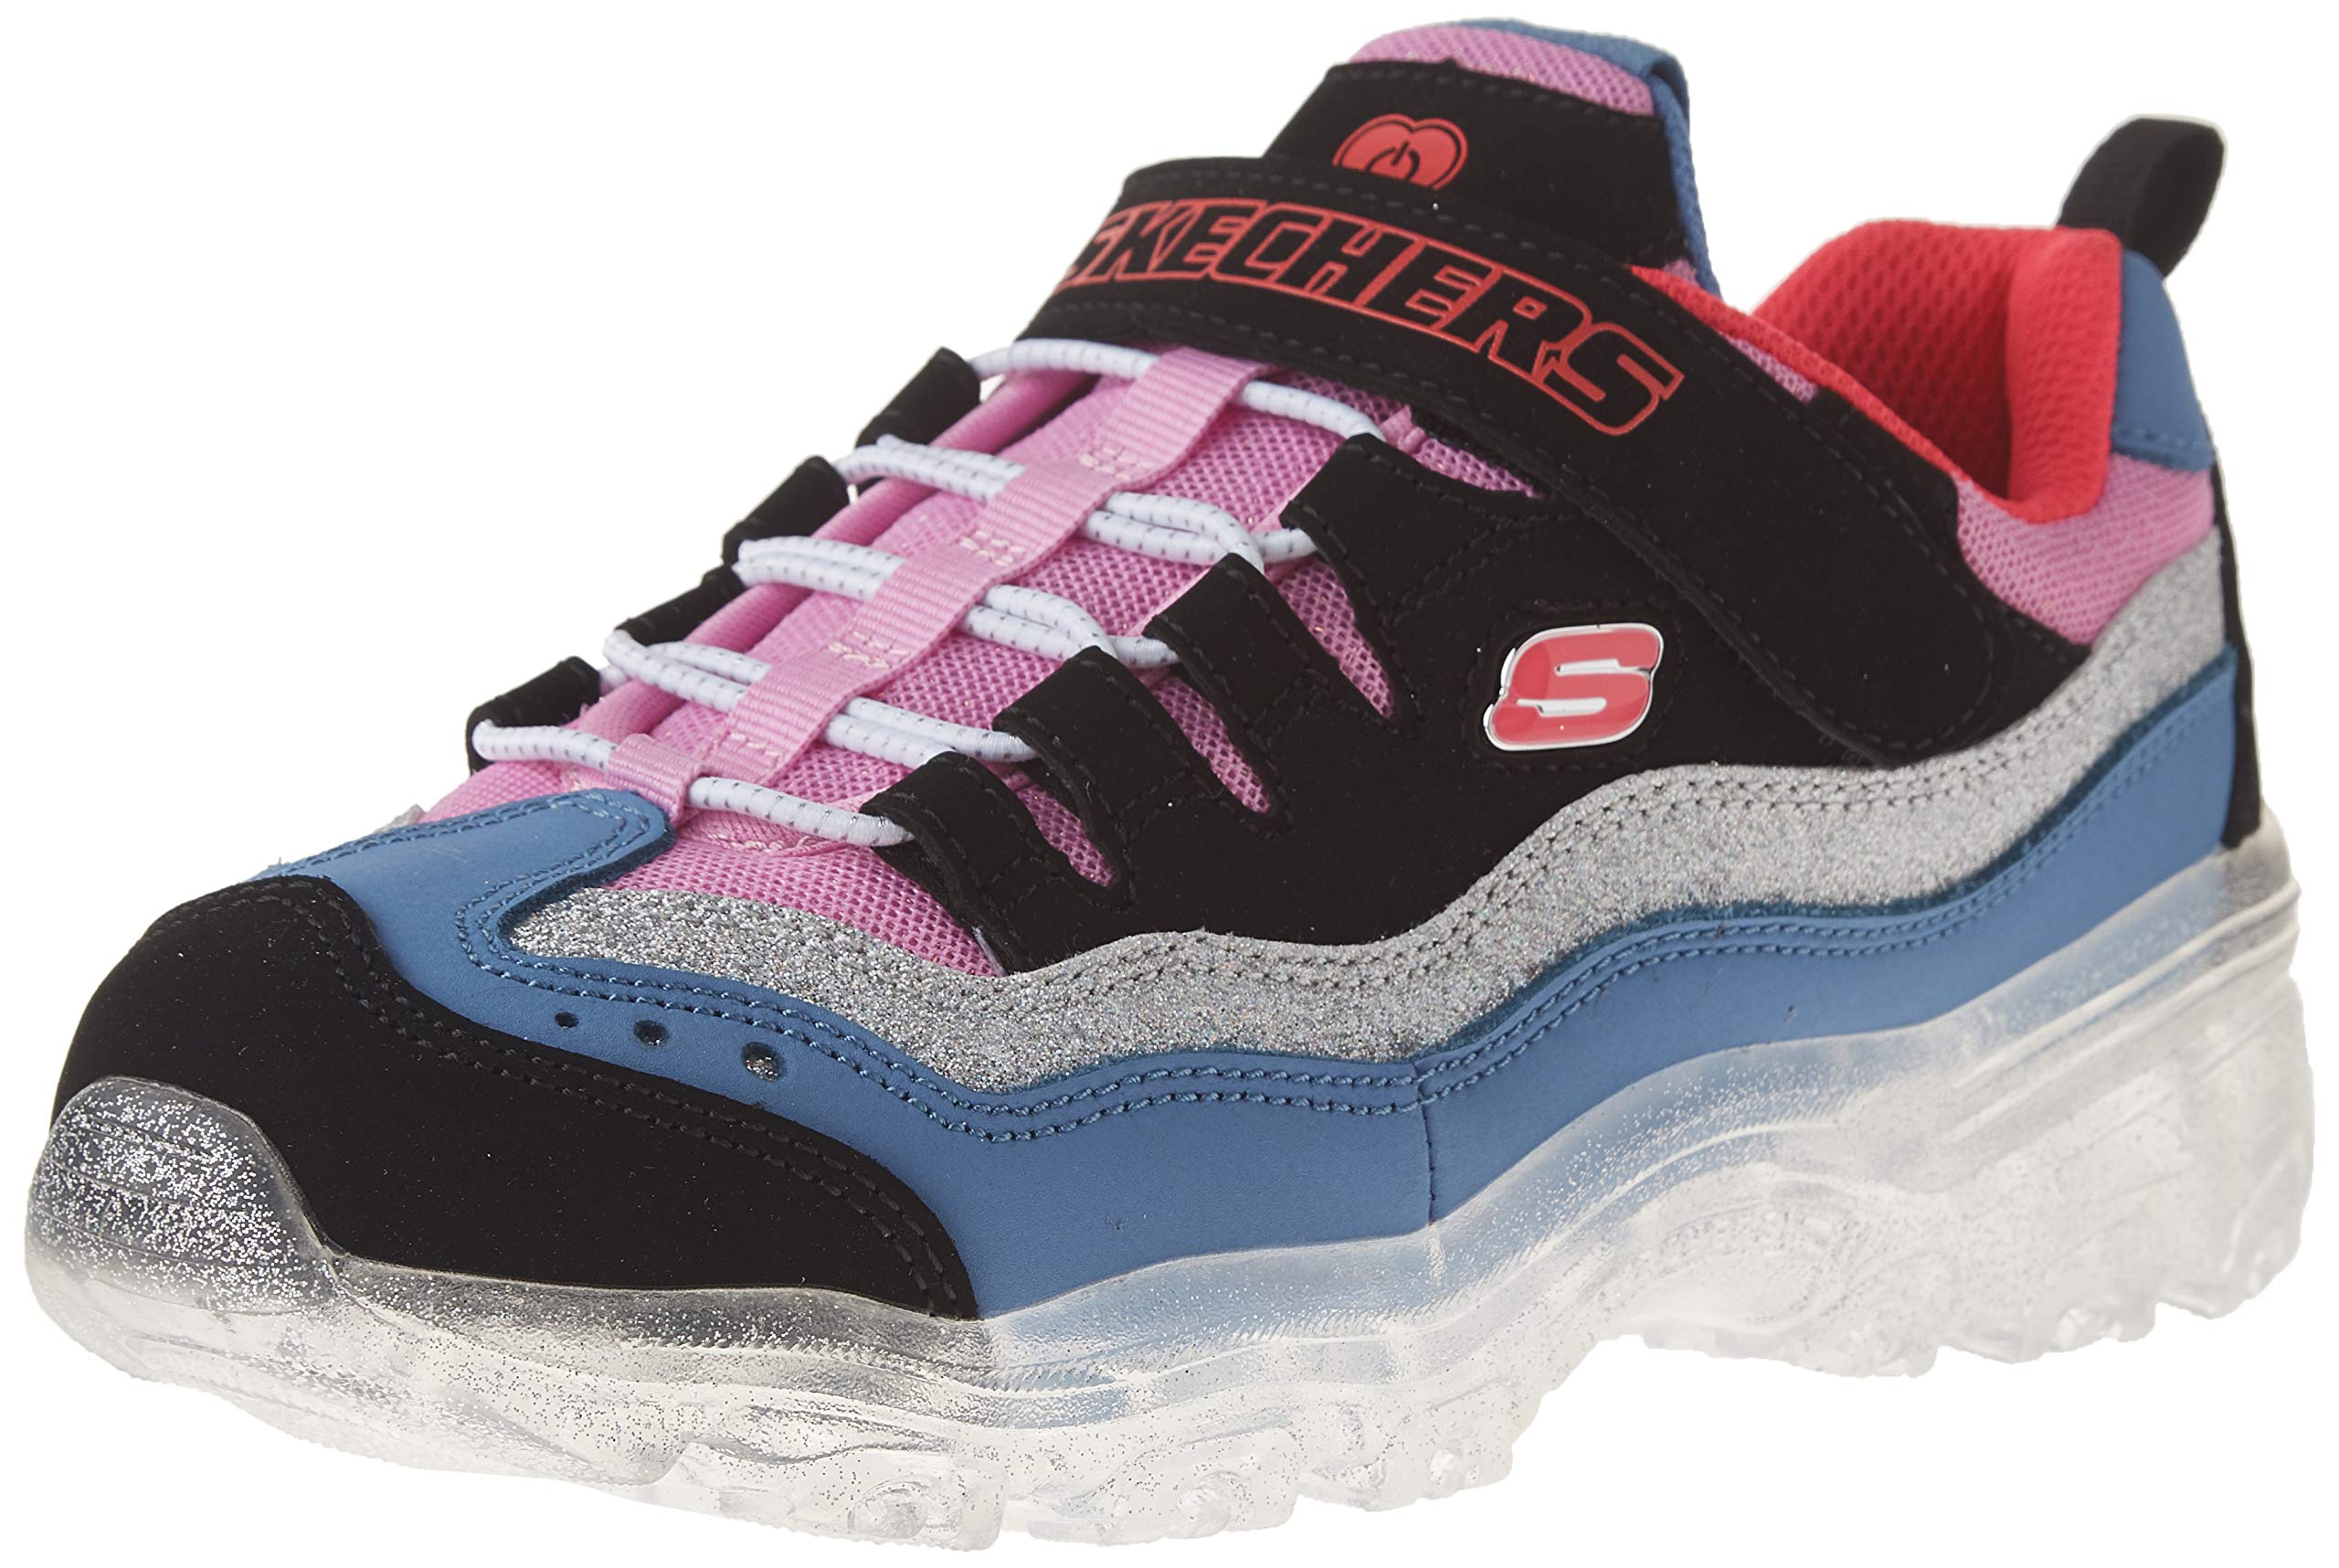 Skechers Kids Girls' ICE Lights Sneaker, Black/Pink/Purple, 4 Medium US Little Kid